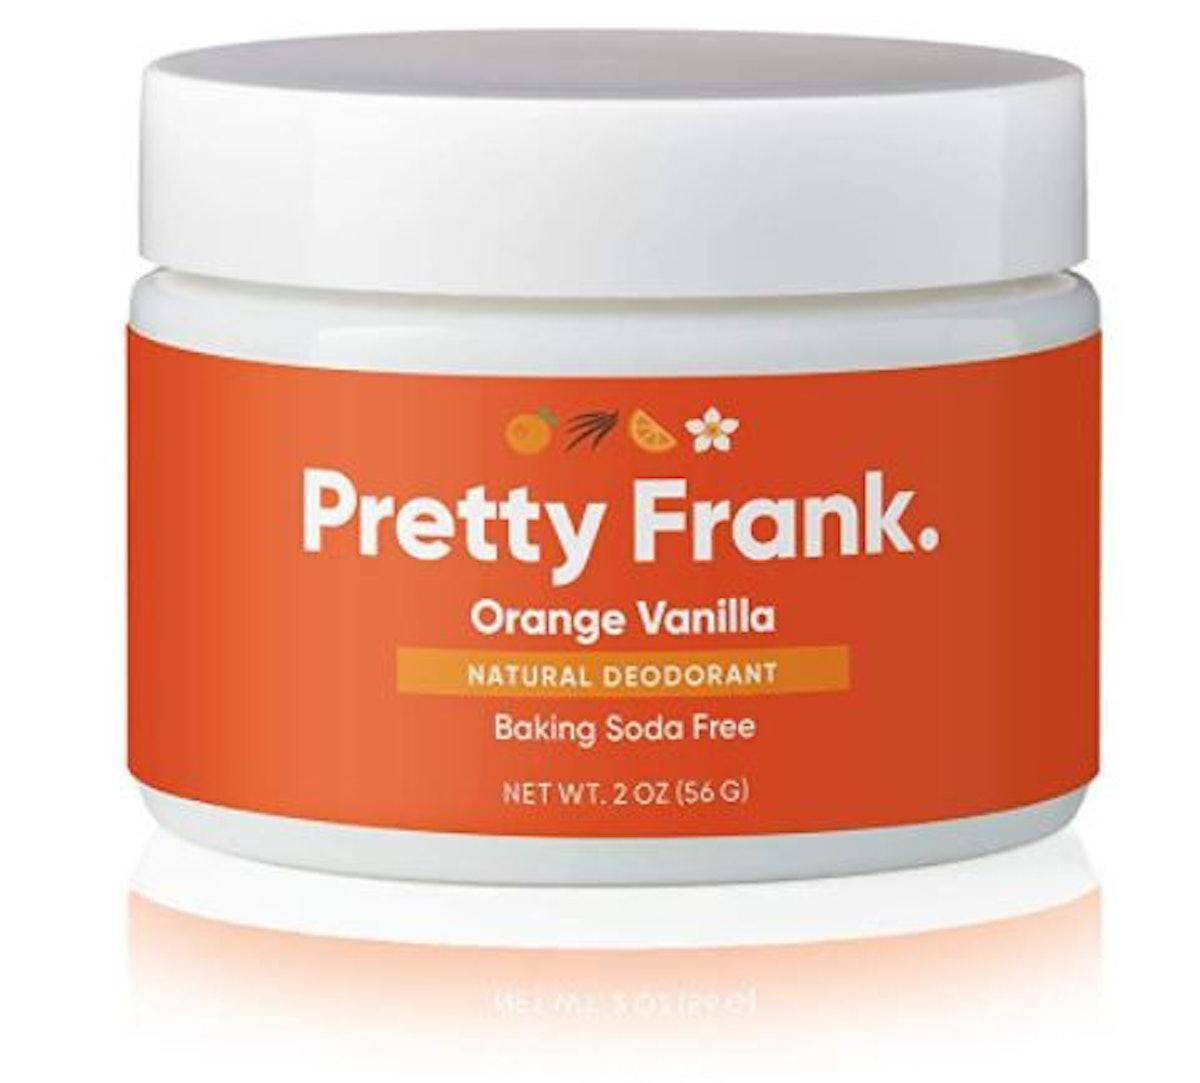 Pretty Frank Natural Deodorant Jar